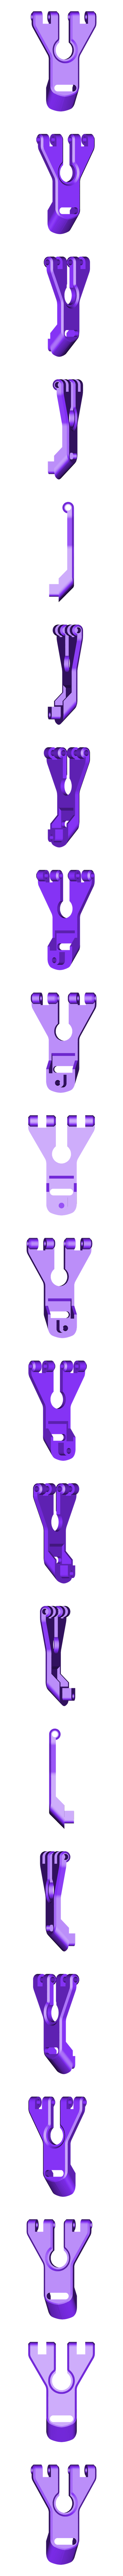 Neutron_-_Effector_CoverE3D.stl Download free STL file Neutron - Open Source 3D Printer • 3D printable object, ATOM3dp